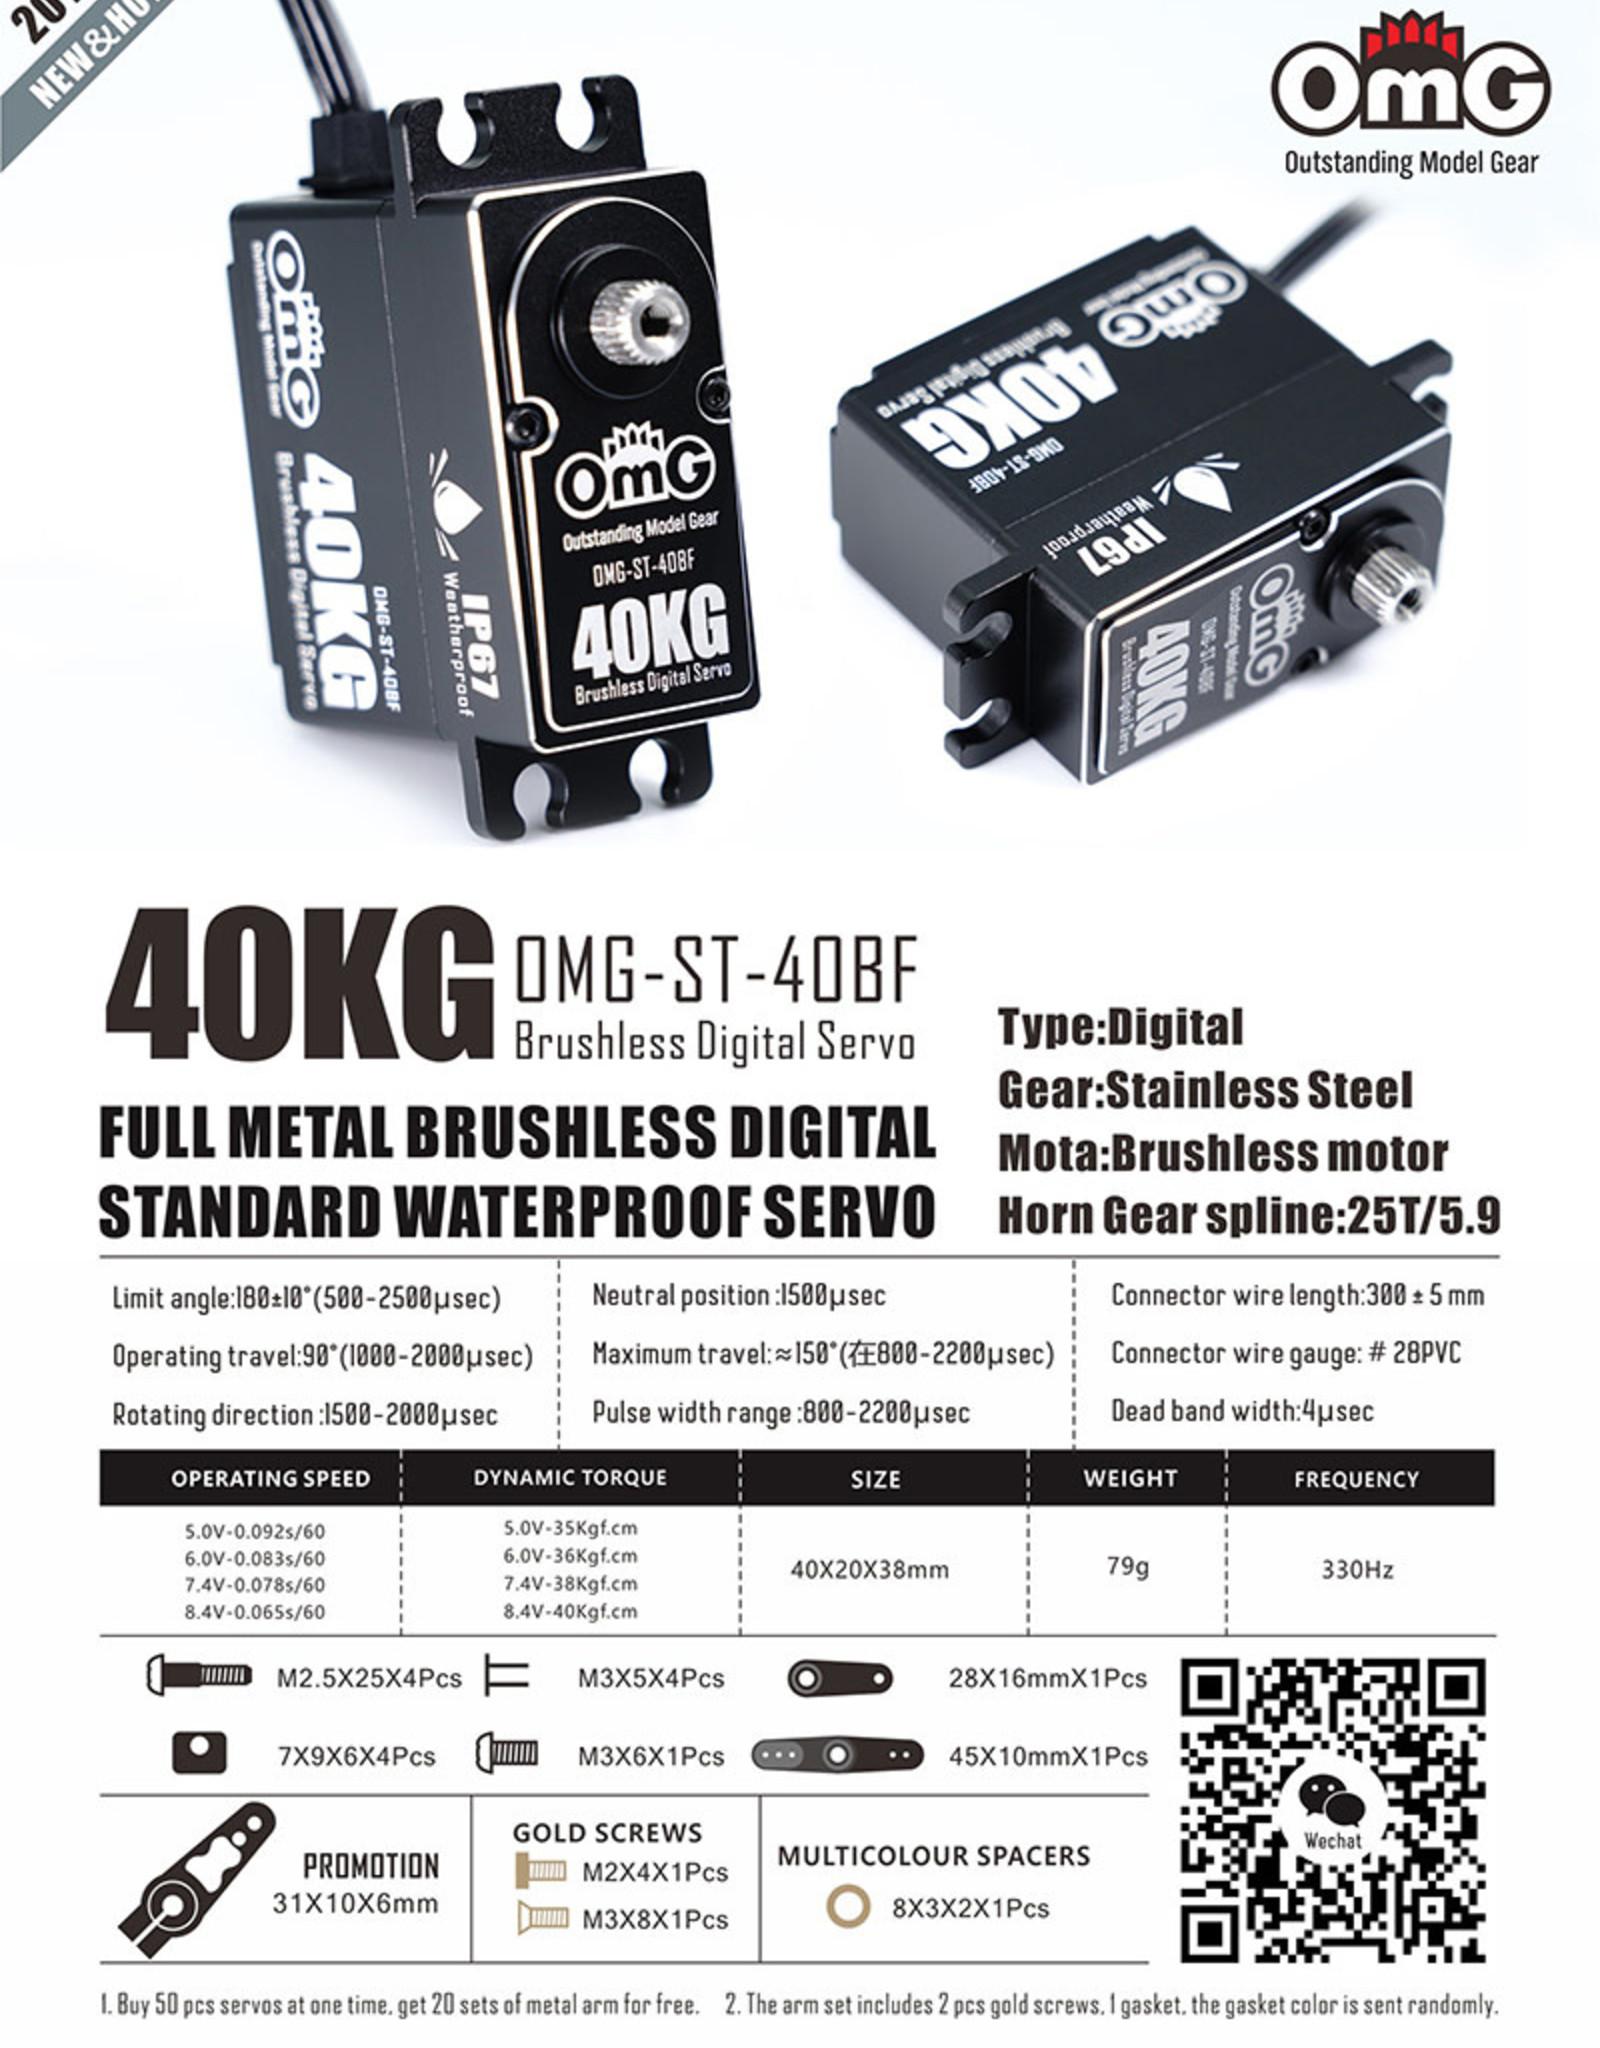 OmG OMG-ST-40BF-PR 40KG WATERPROOF BRUSHLESS DIGITAL SERVO